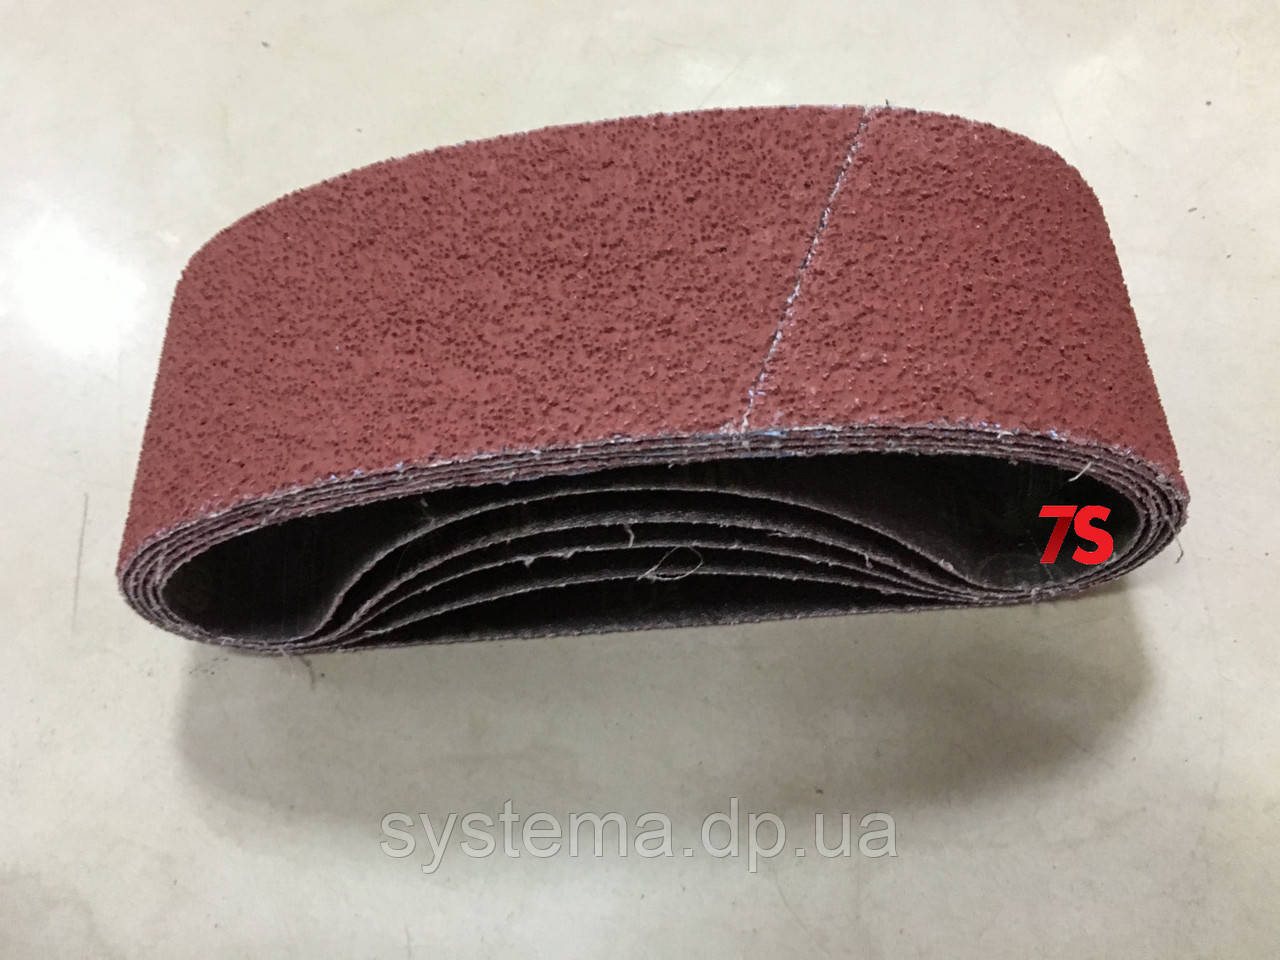 3M™ Cubitron™ II 984F - Шлифовальная лента 89x394 мм,